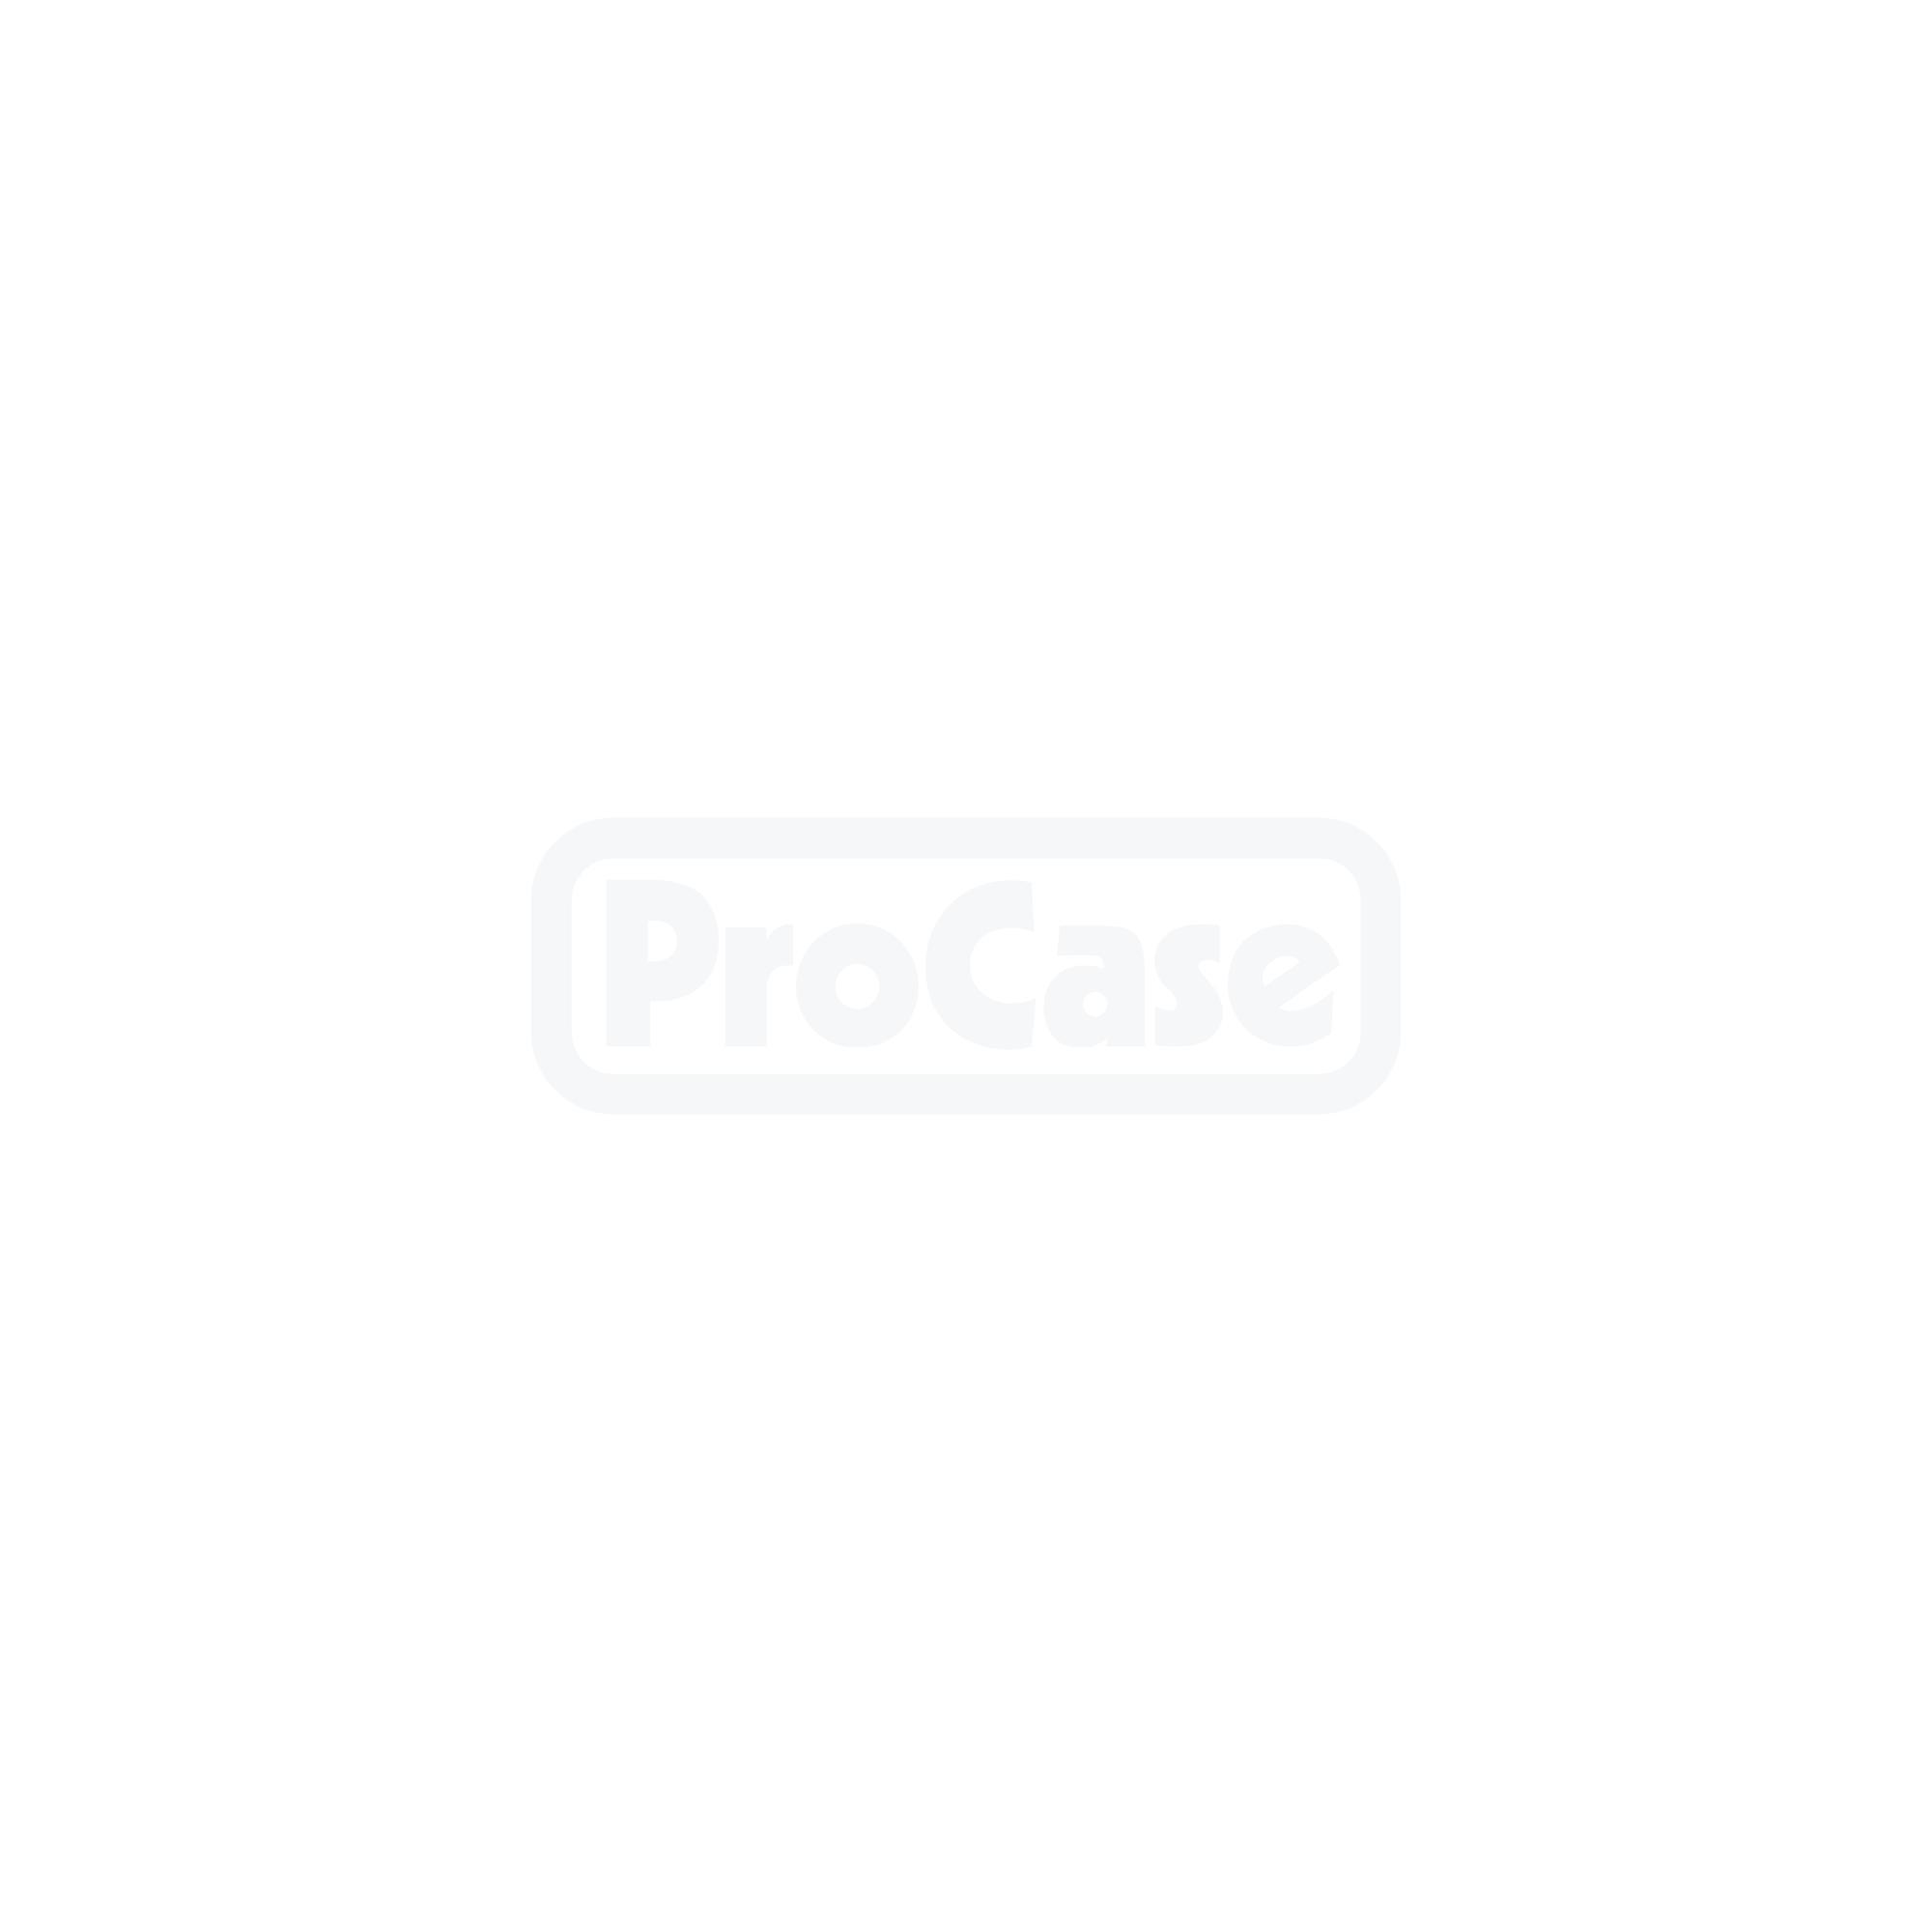 Flightcase für Arri L7-C/L7-T